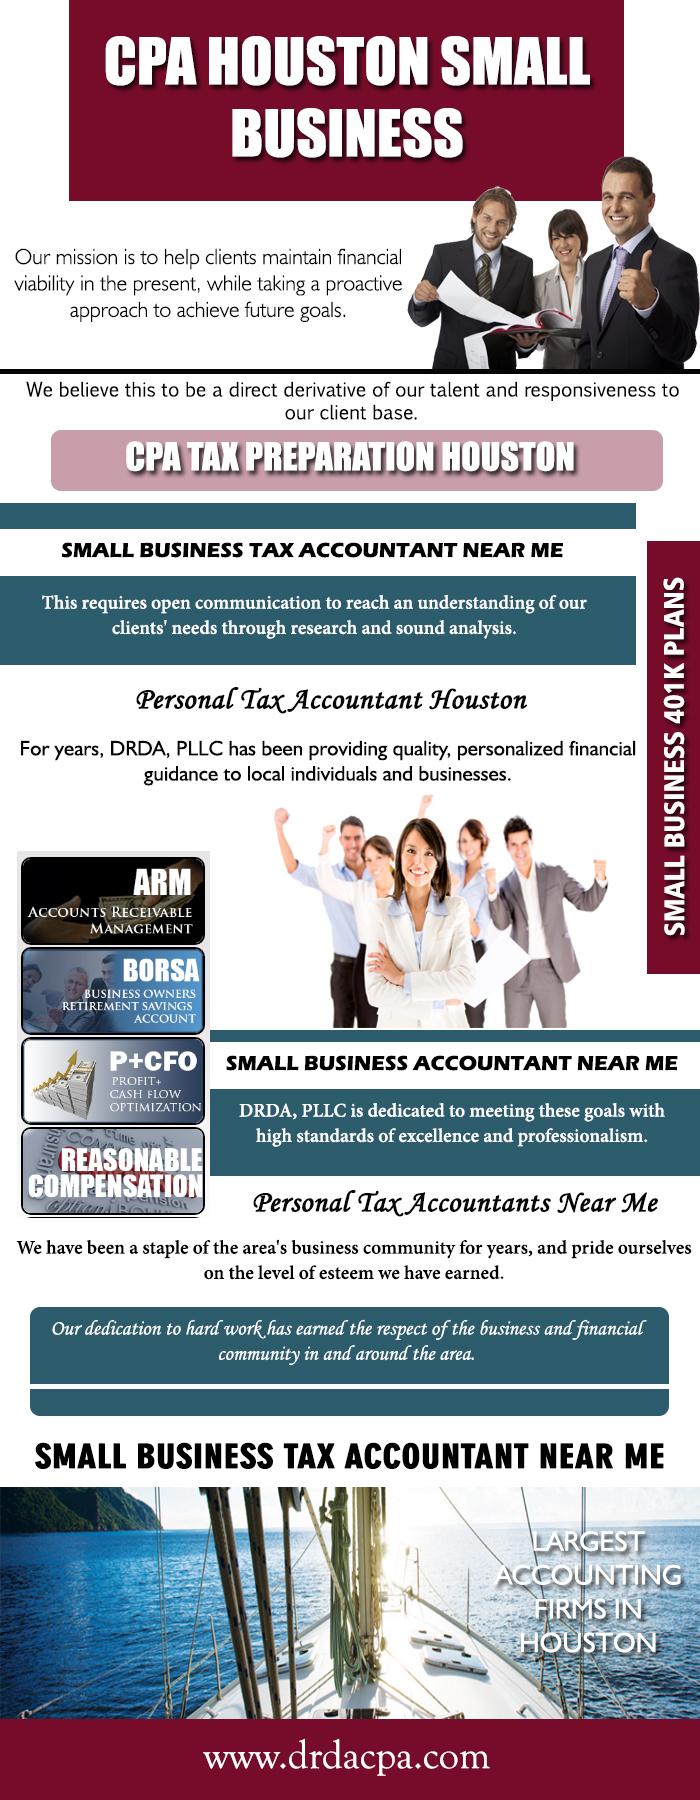 personal tax accountants nearme